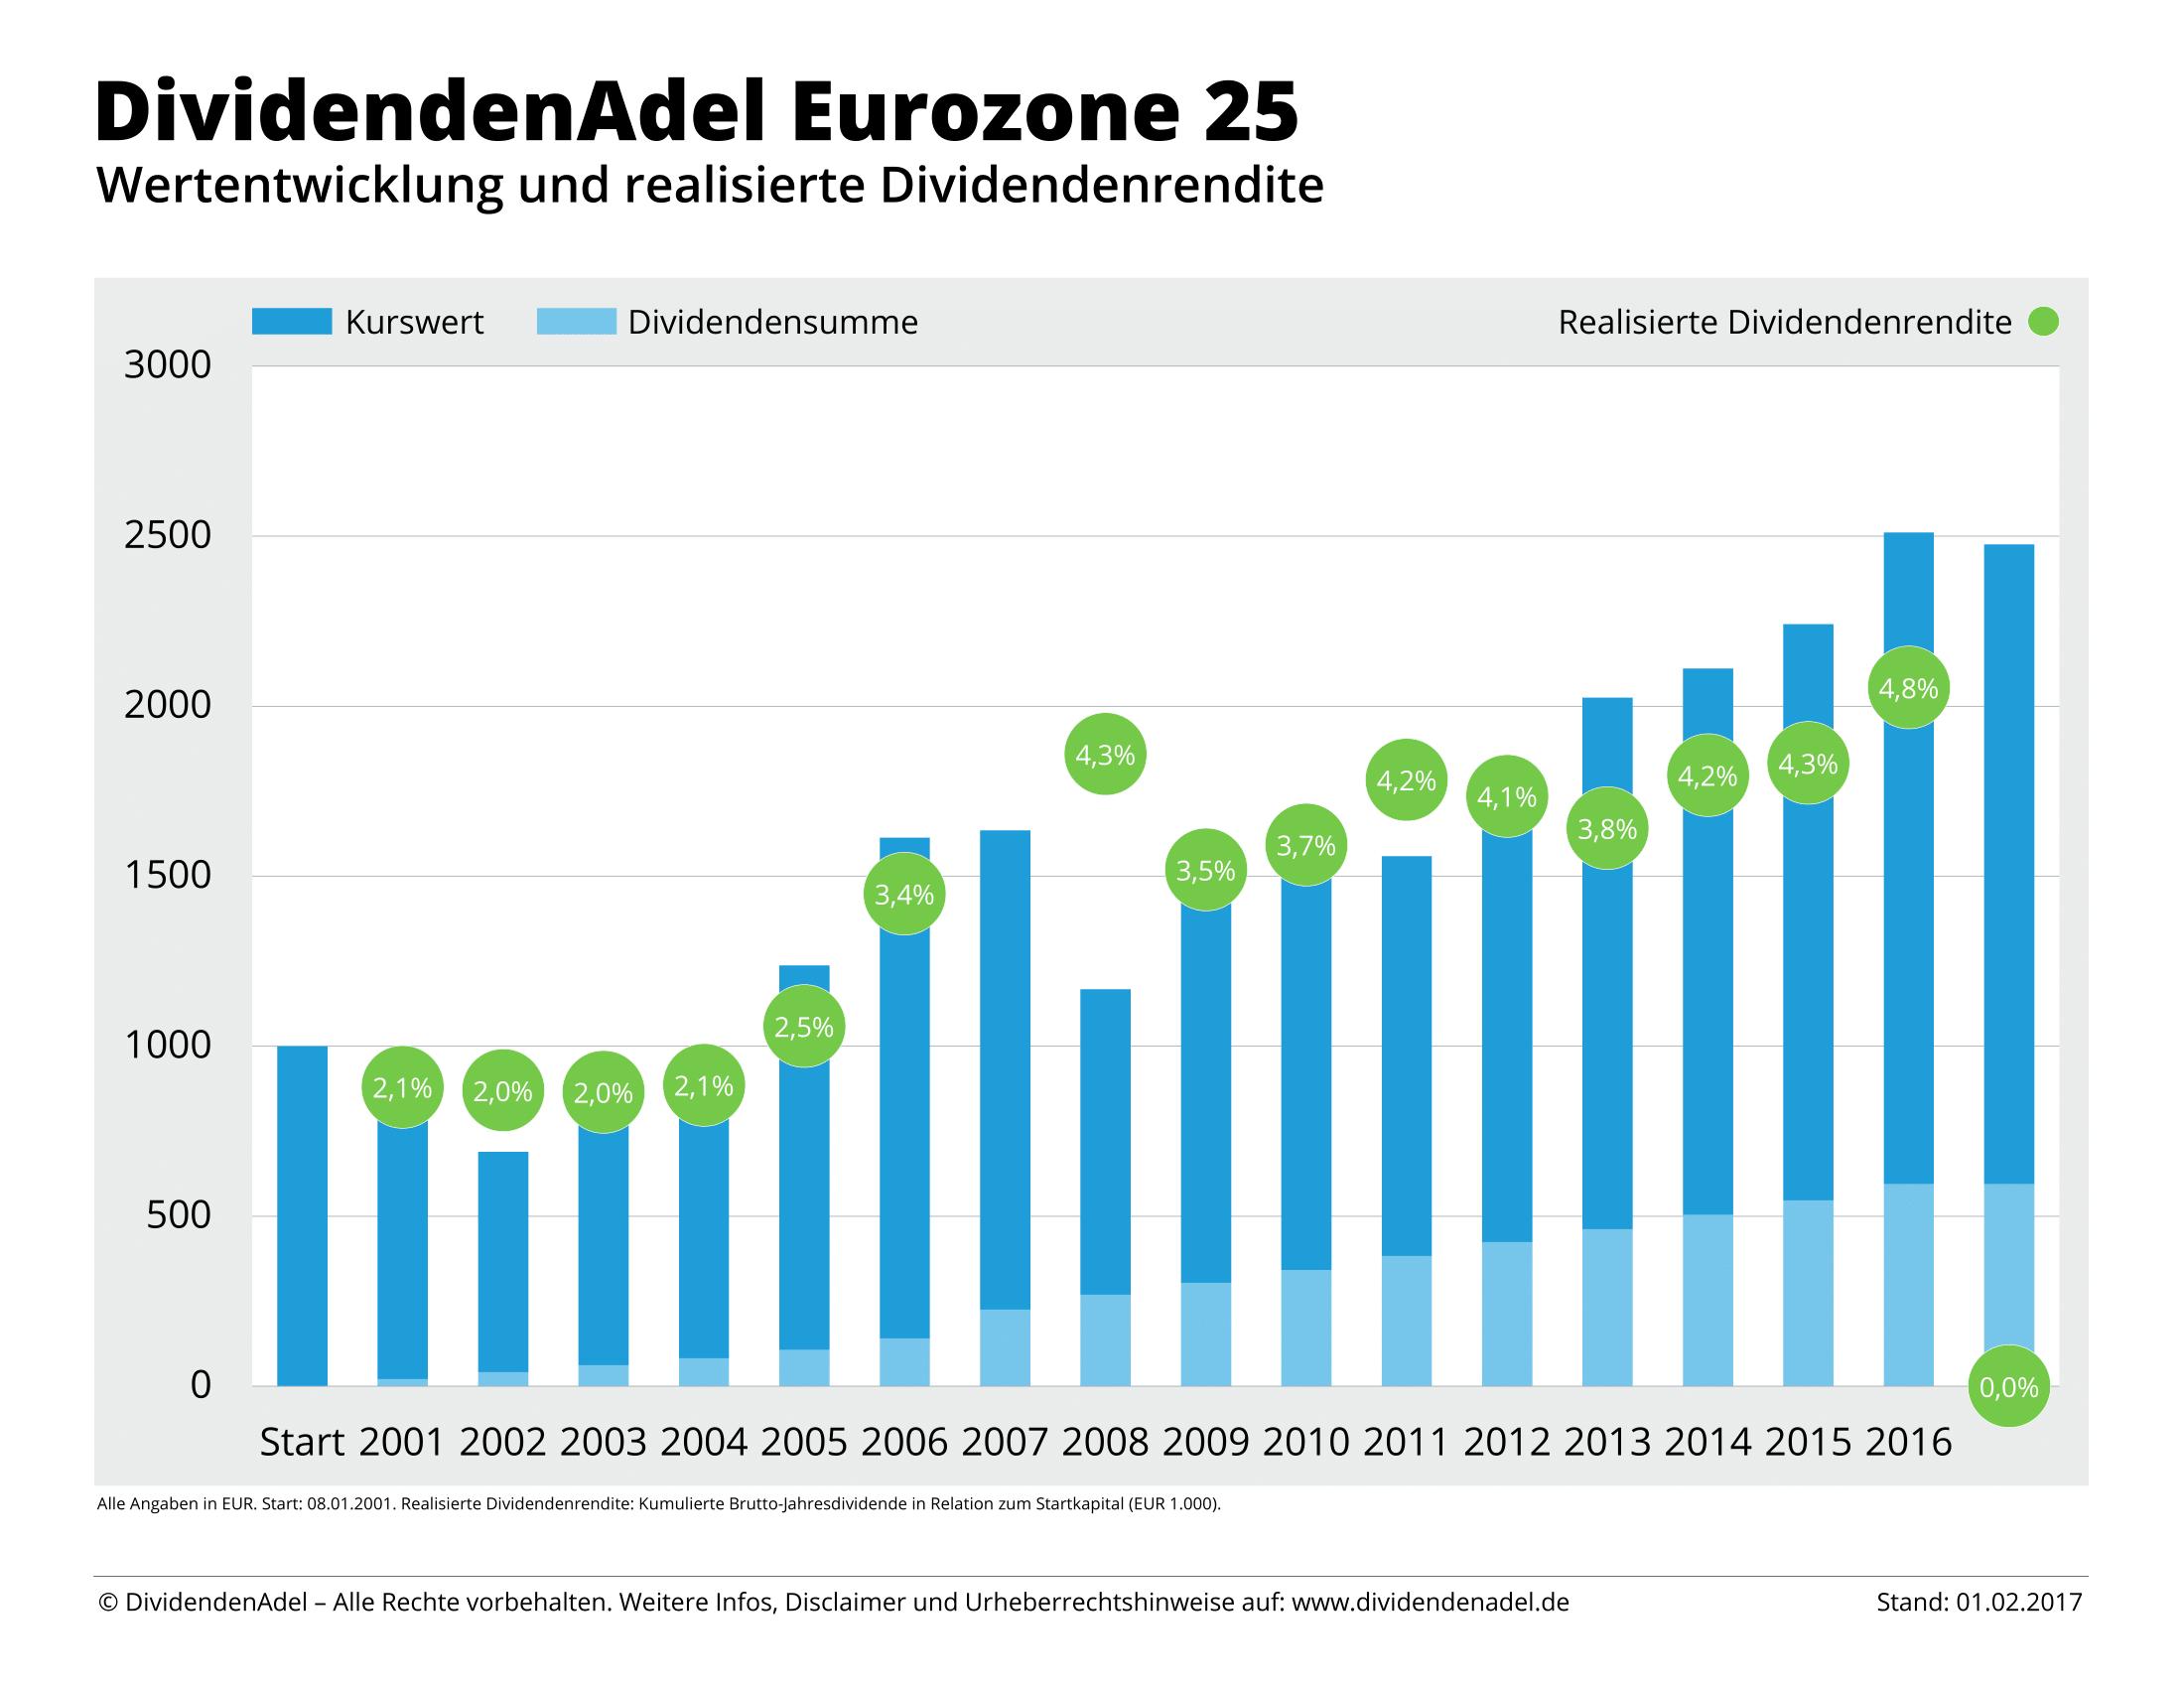 DividendenAdel Eurozone 25